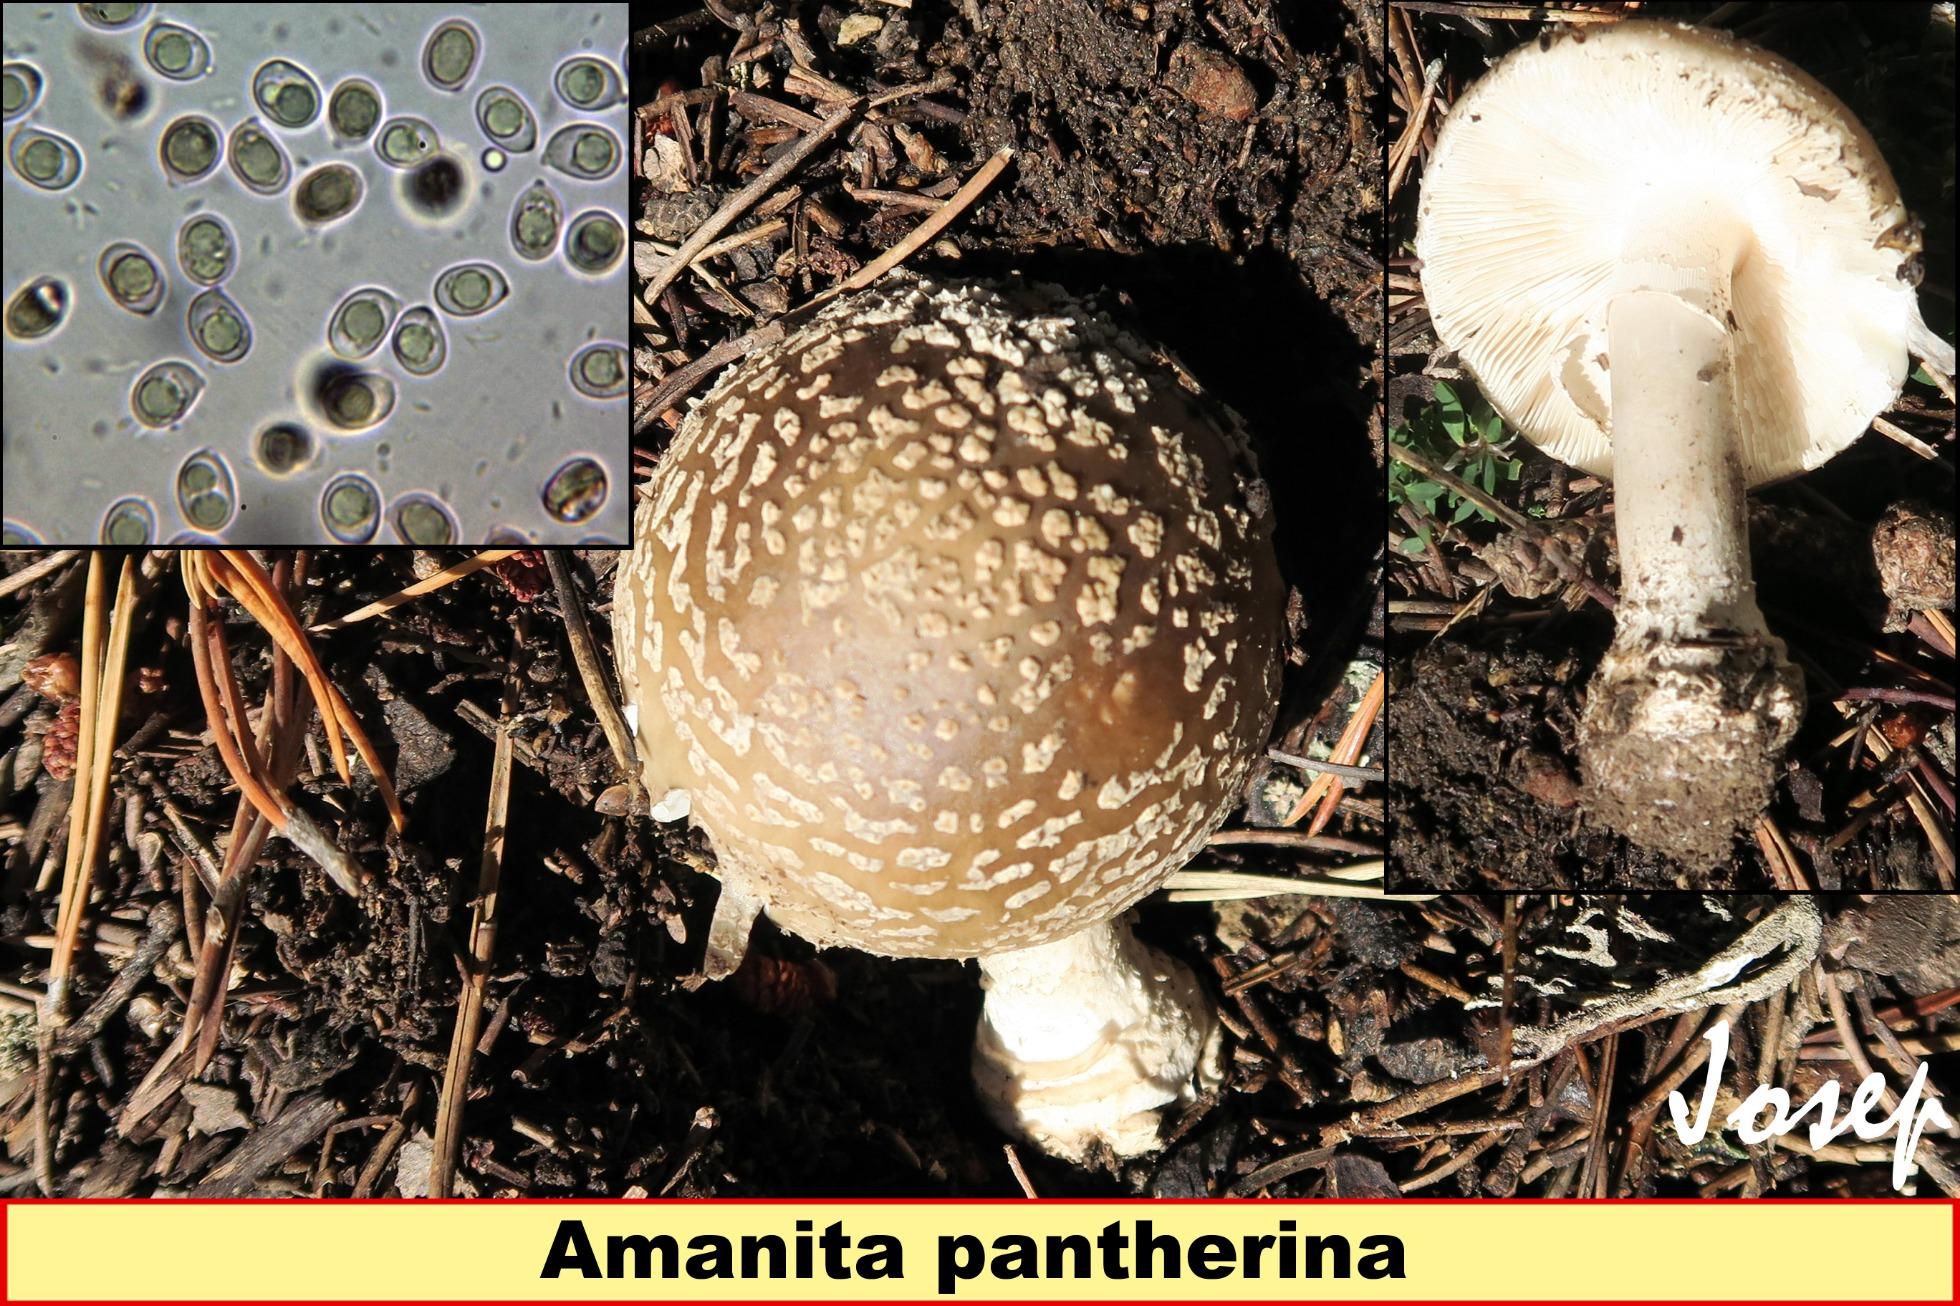 Amanitapantherina_2018-12-17.jpg